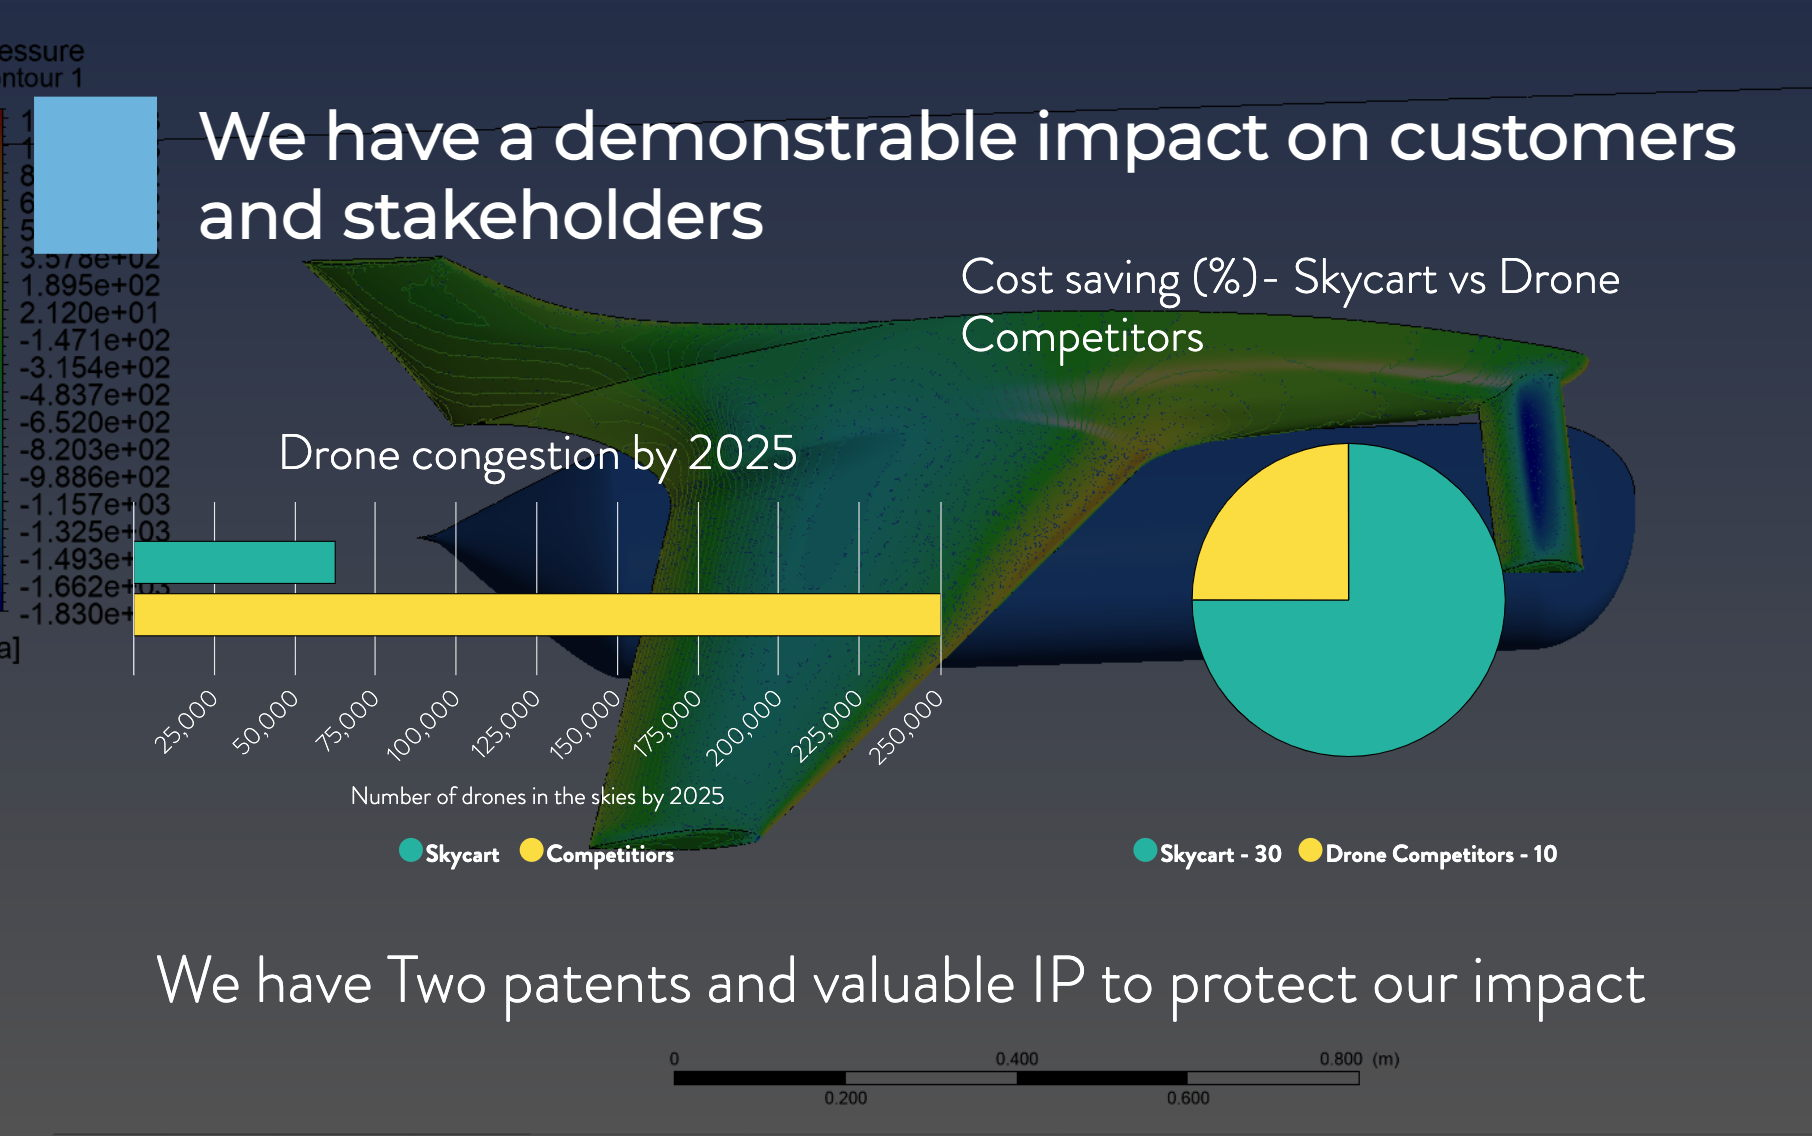 Skycart - Wefunder - sUAS Information 11